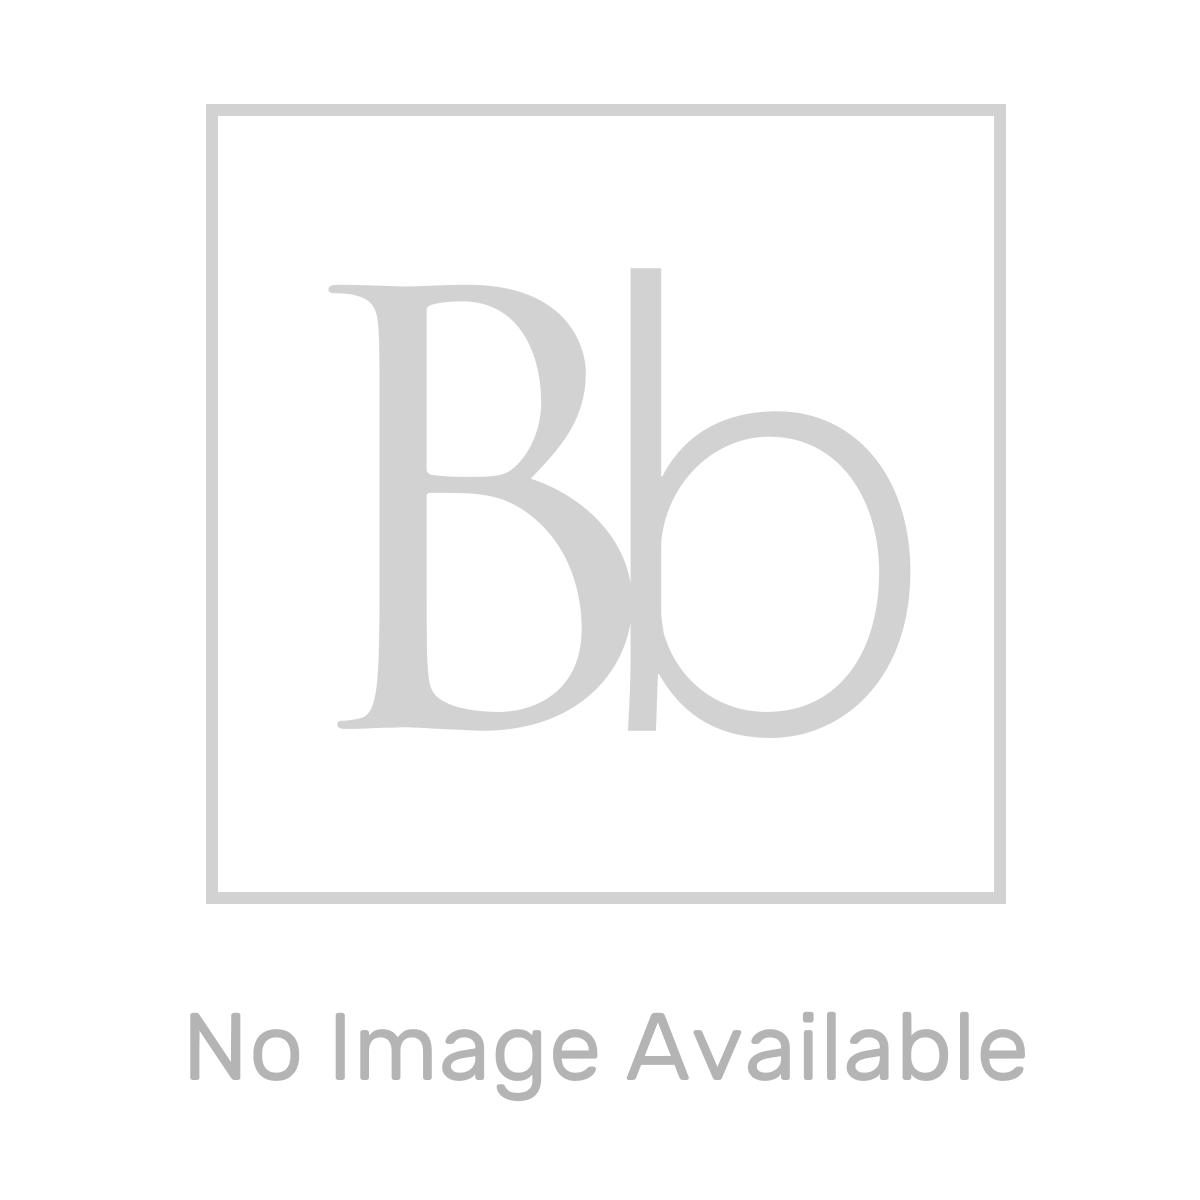 Aquadart Offset Quadrant 1200 x 900 Shower Tray Right Handed